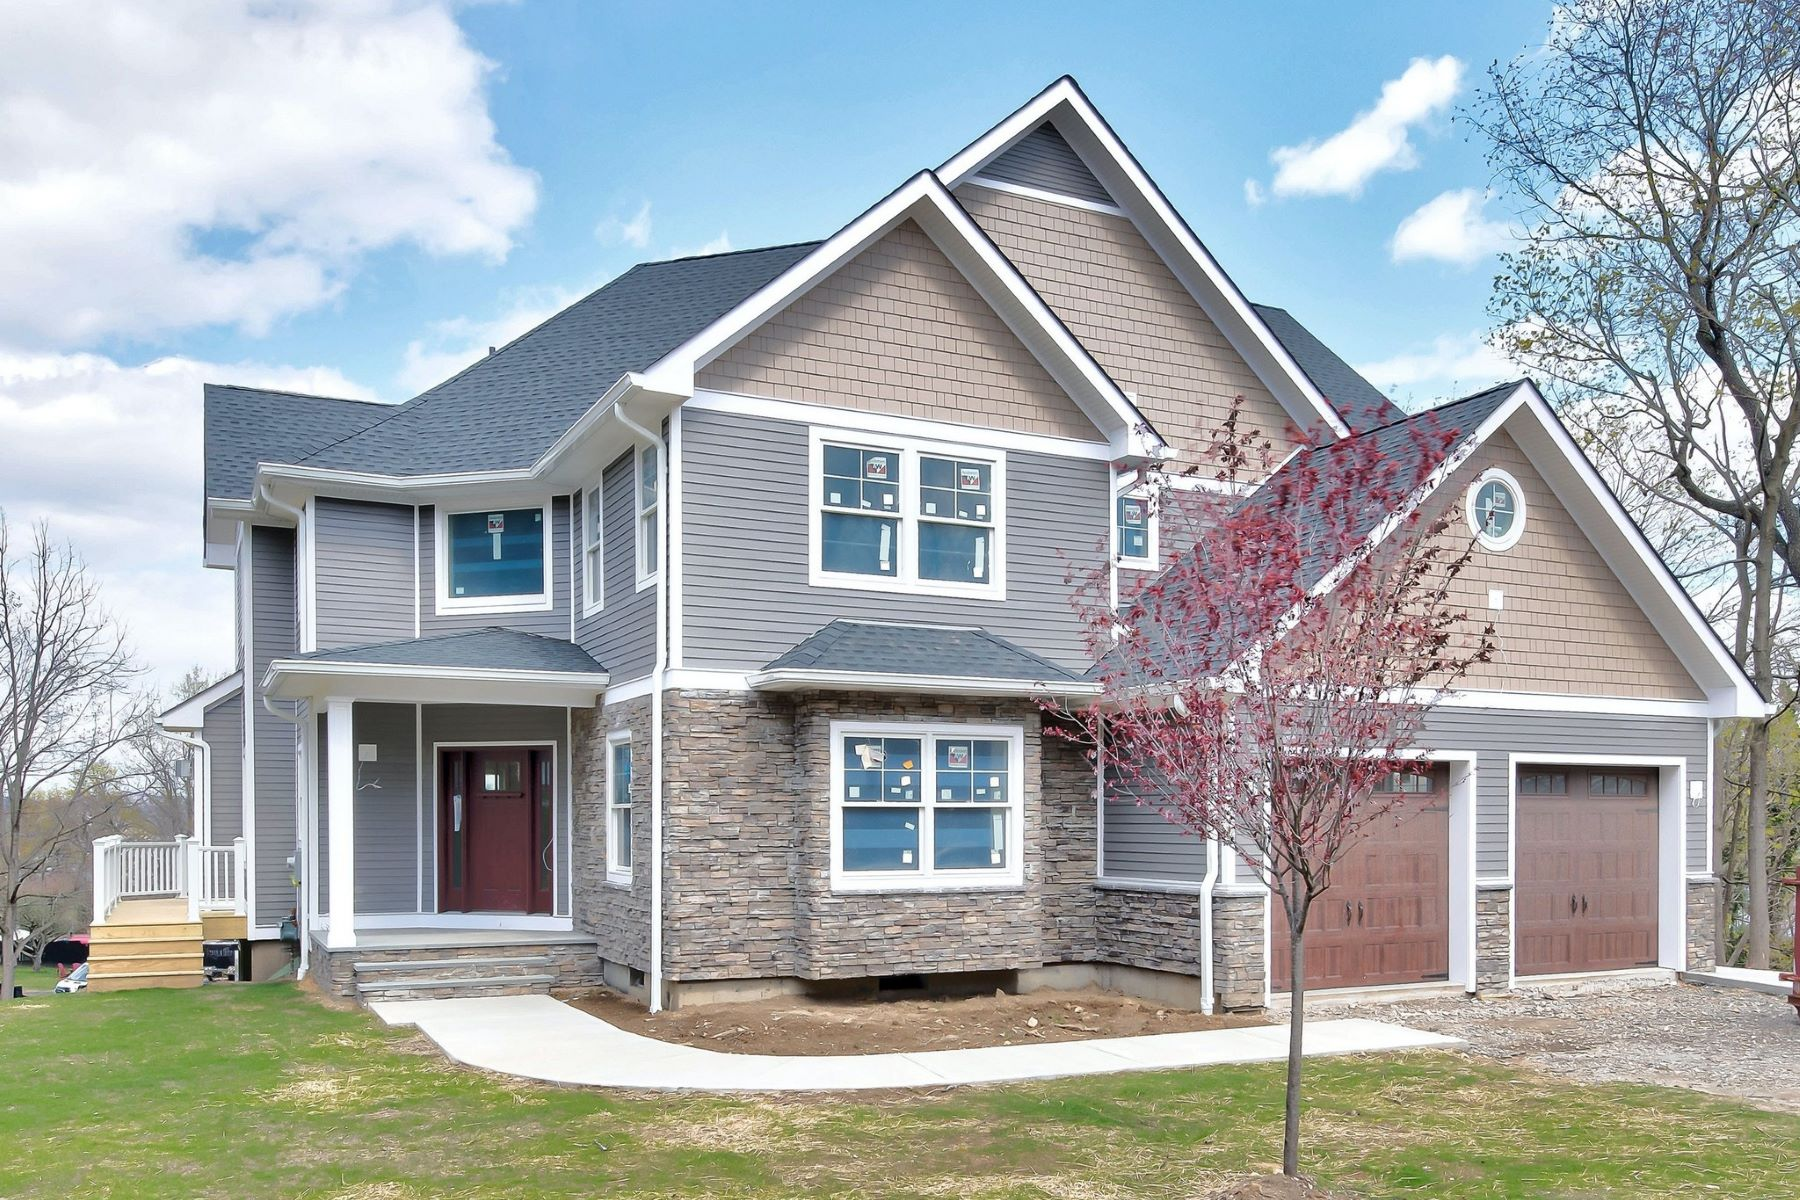 Single Family Homes for Active at Luxurious Custom New Construction 190 Mott Farm Road Stony Point, New York 10986 United States